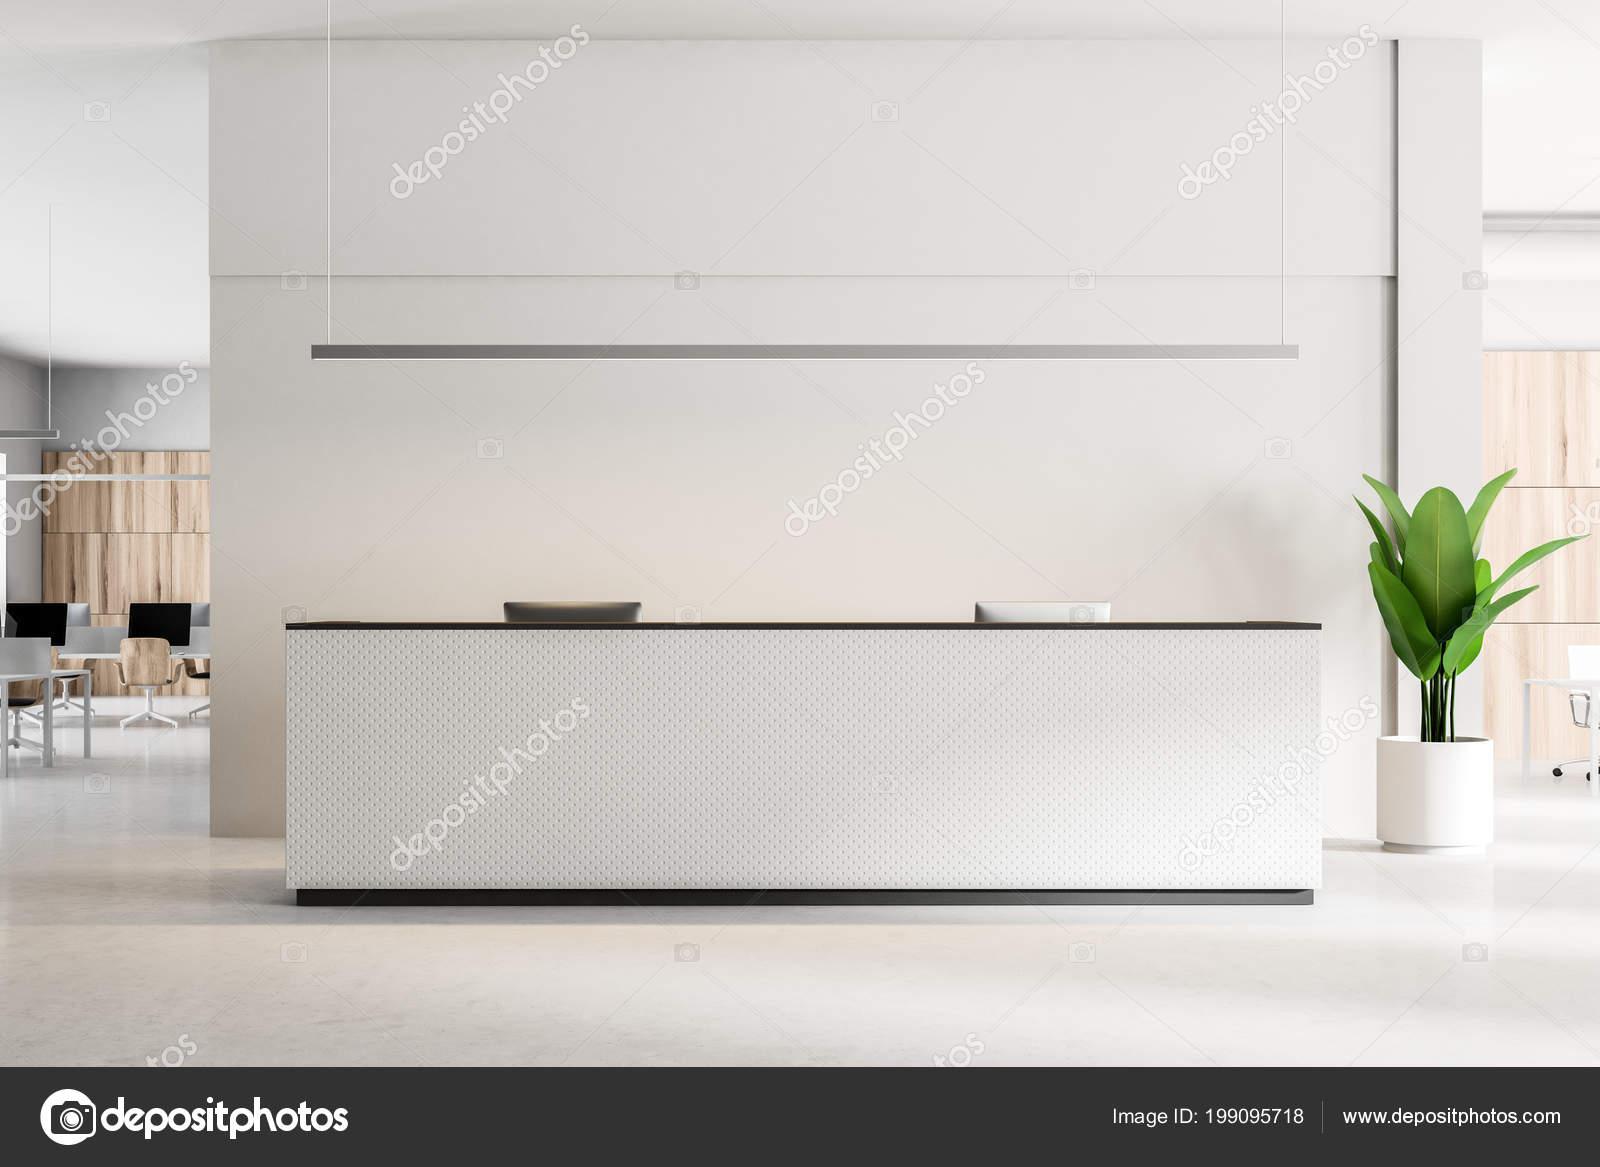 White Reception Desk Computers Standing Concrete Floor ...